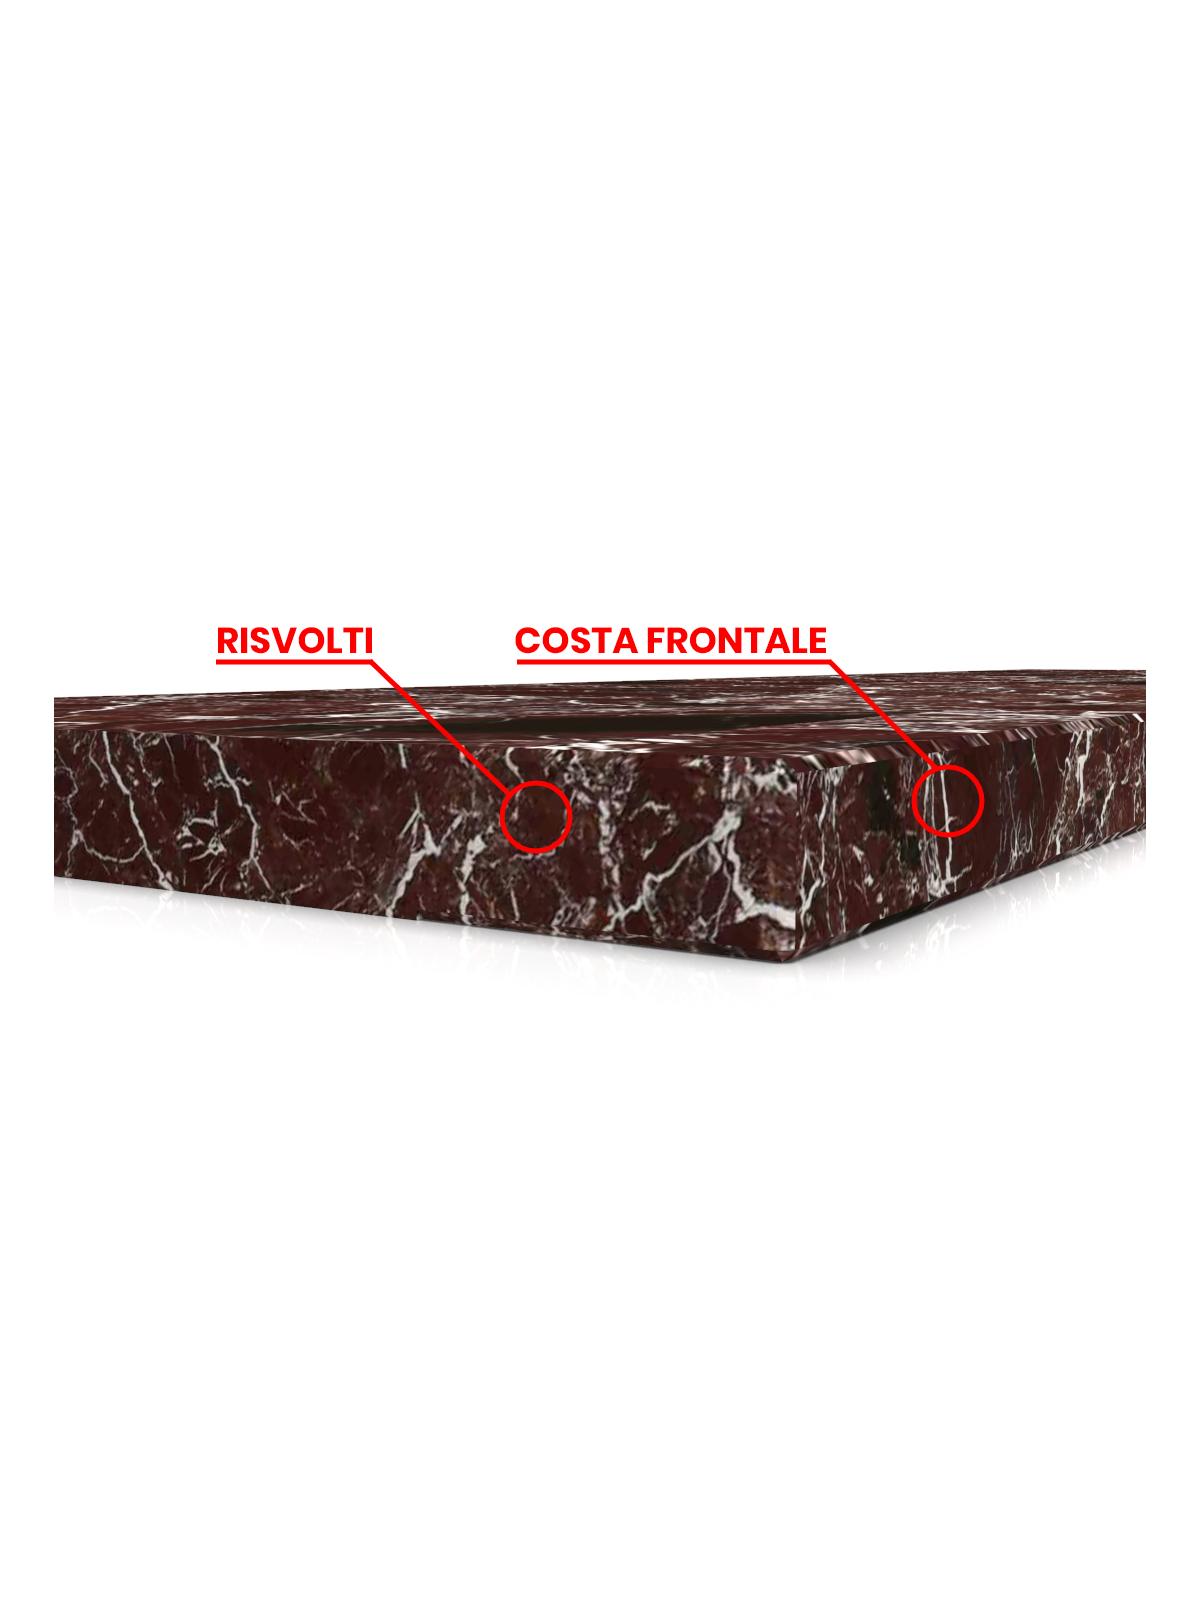 Schwellenwerte in Rosso Levanto